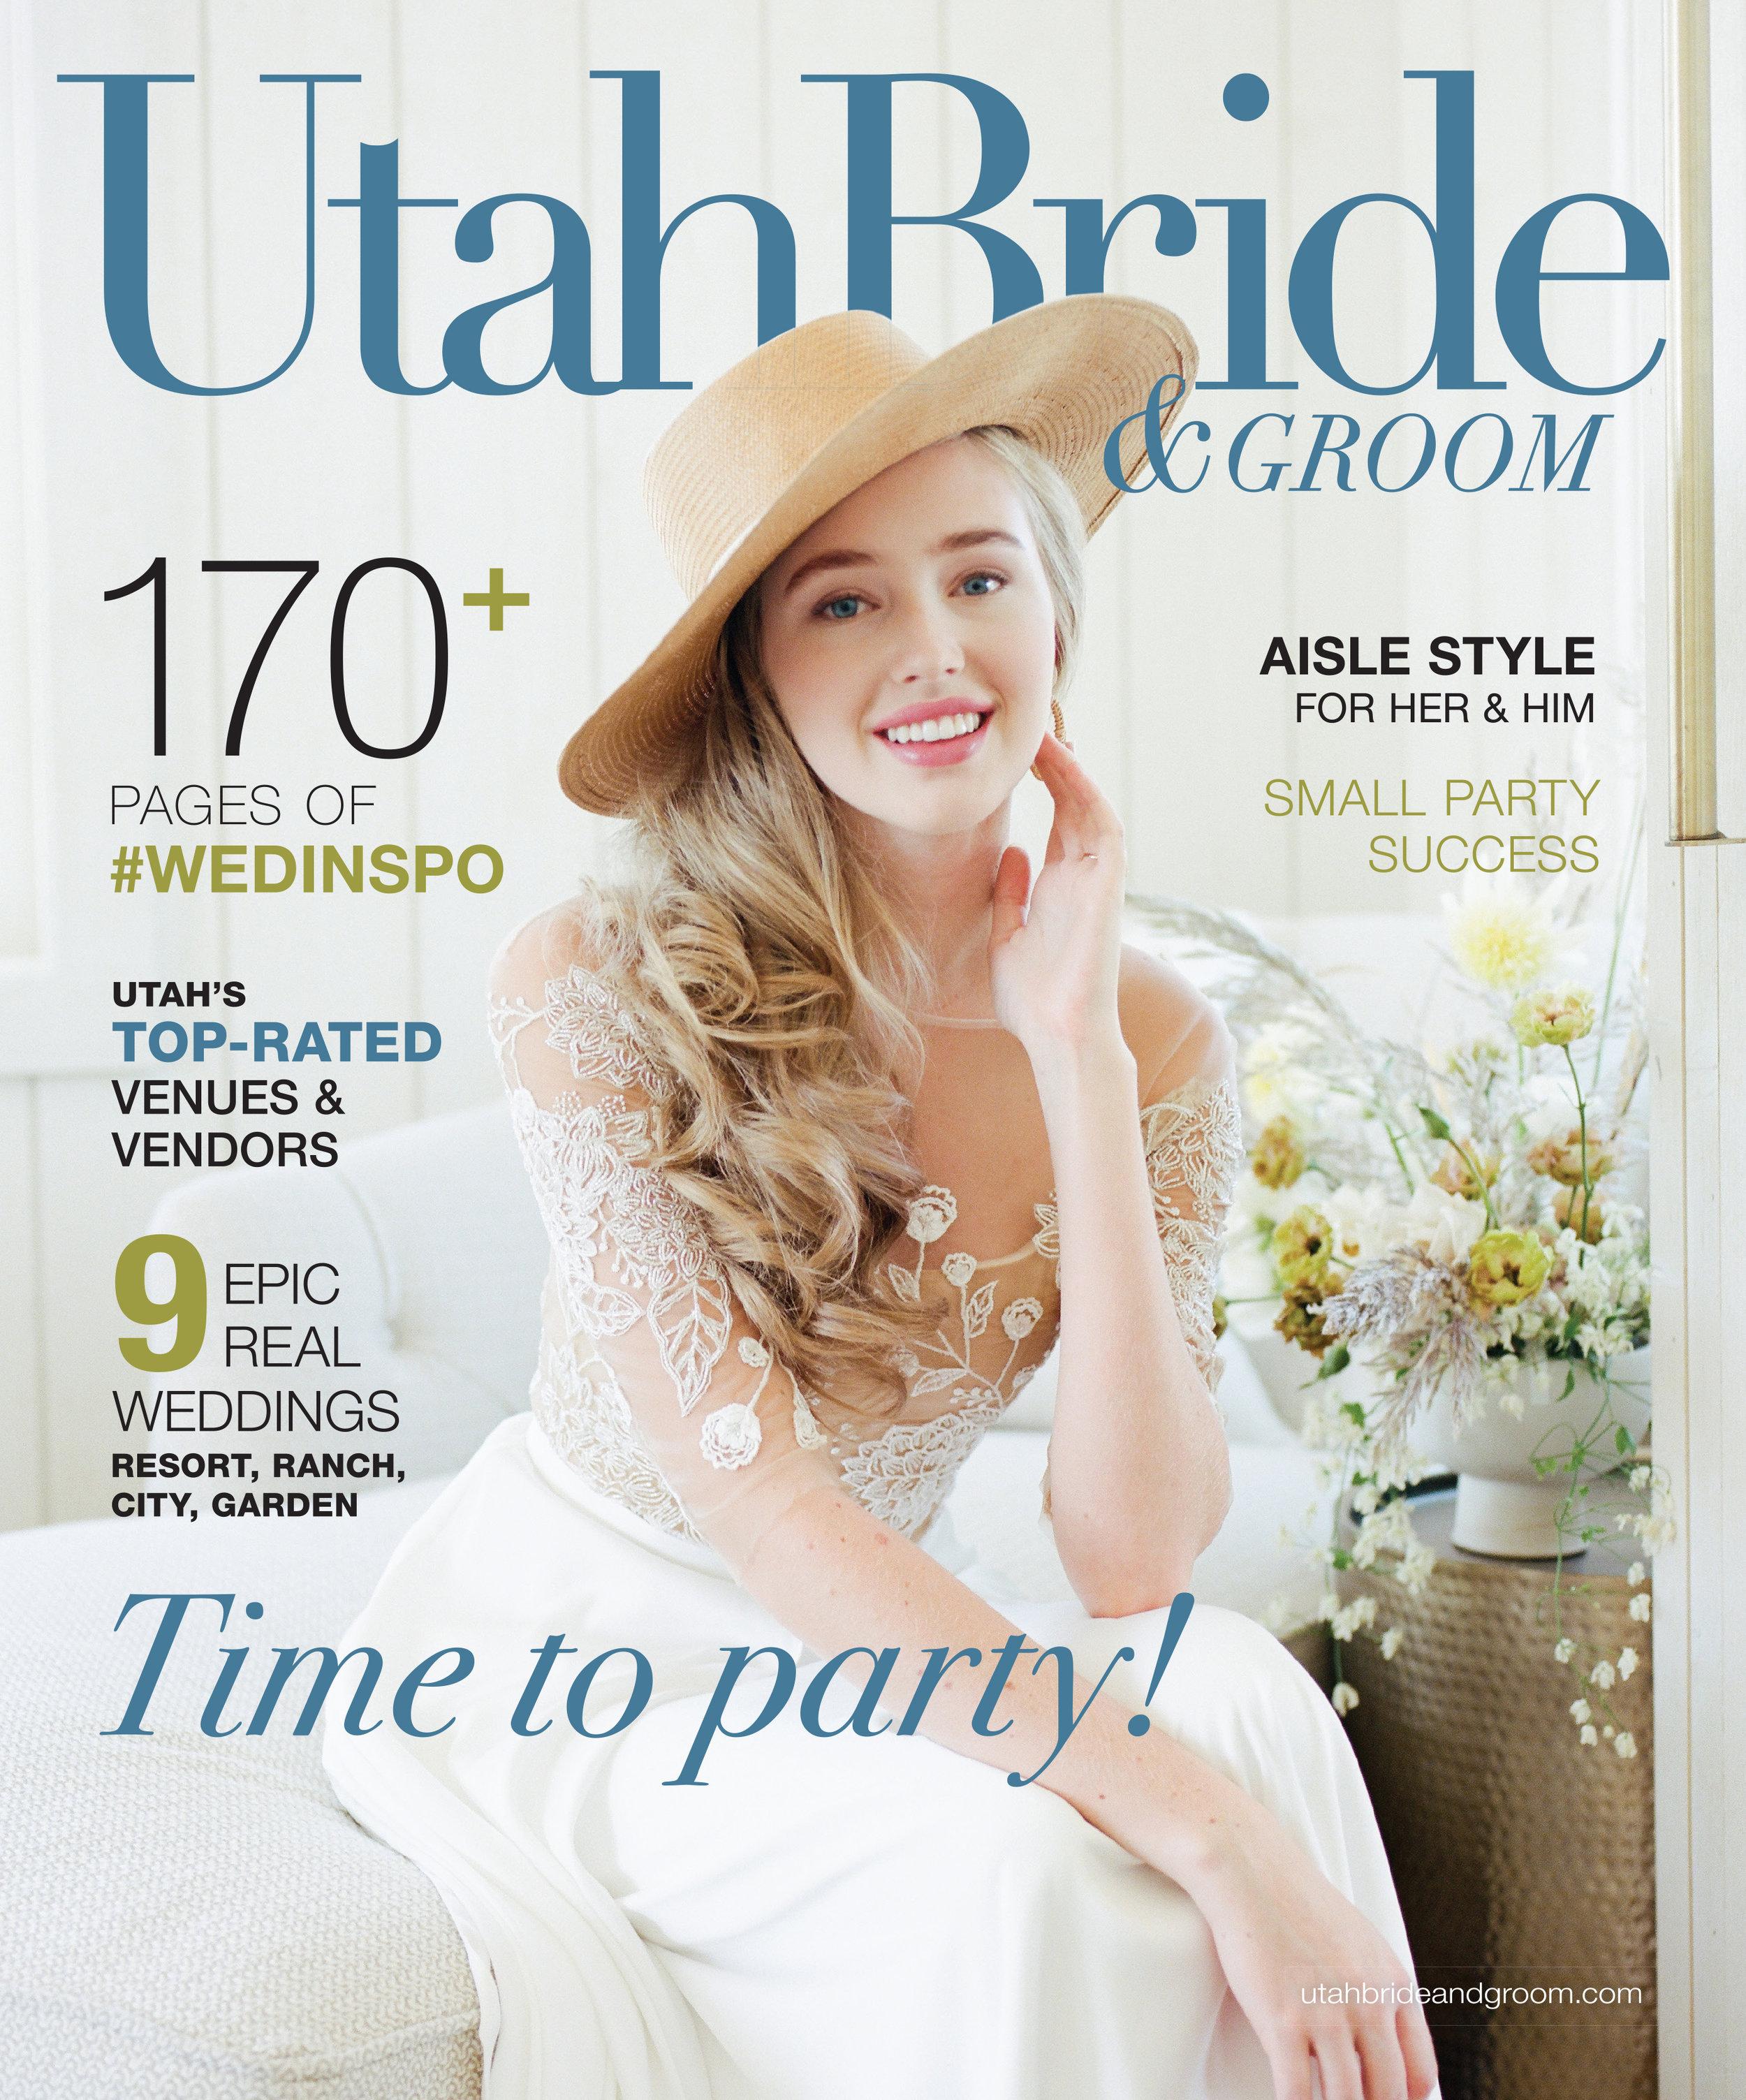 Winter Wedding Inspiration | Burgundy Wedding | Emerald Green Decor | Utah Bride & Groom Magazine | Michelle Leo Events | Utah Event Planner and Designer